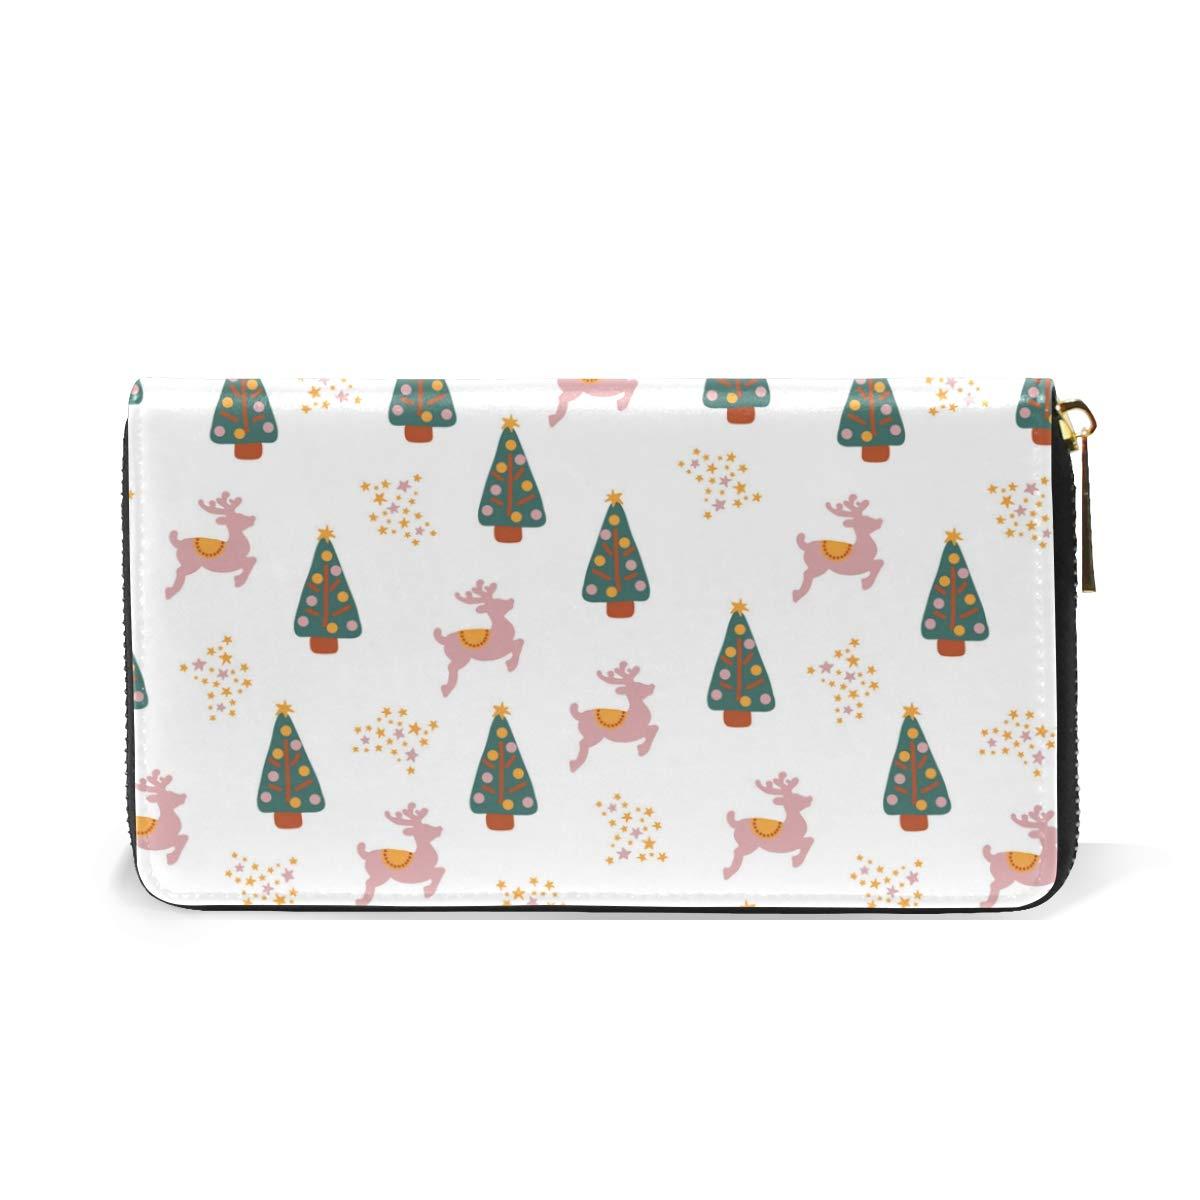 Flock Christmas Tree Real Leather Zip Around Wallet Wristlet minimalist wallet Travel Purse Wristlet